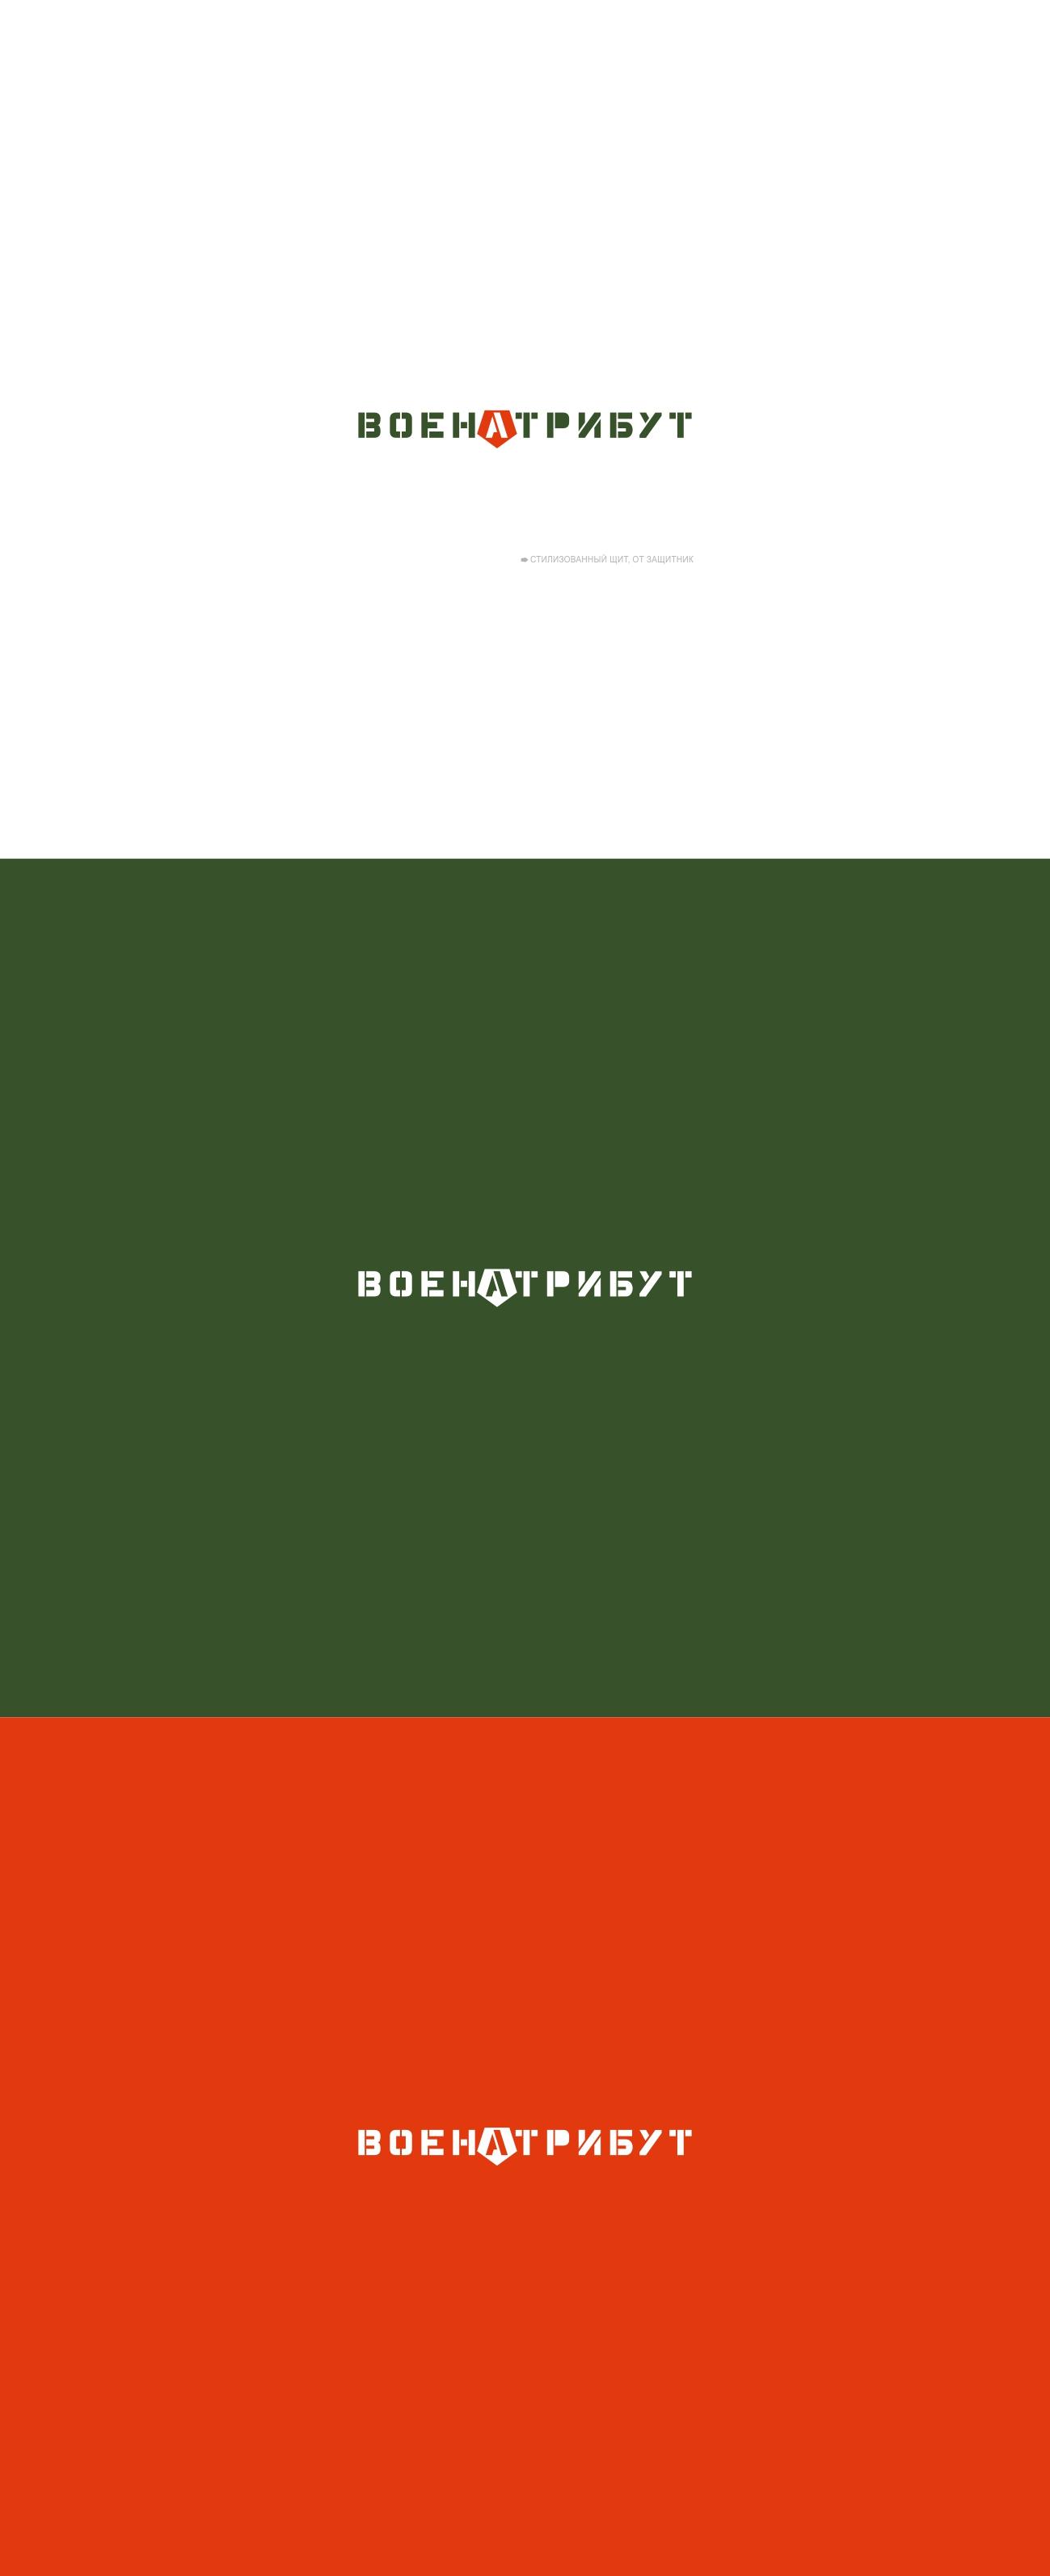 Разработка логотипа для компании военной тематики фото f_305601be59fa45f2.jpg